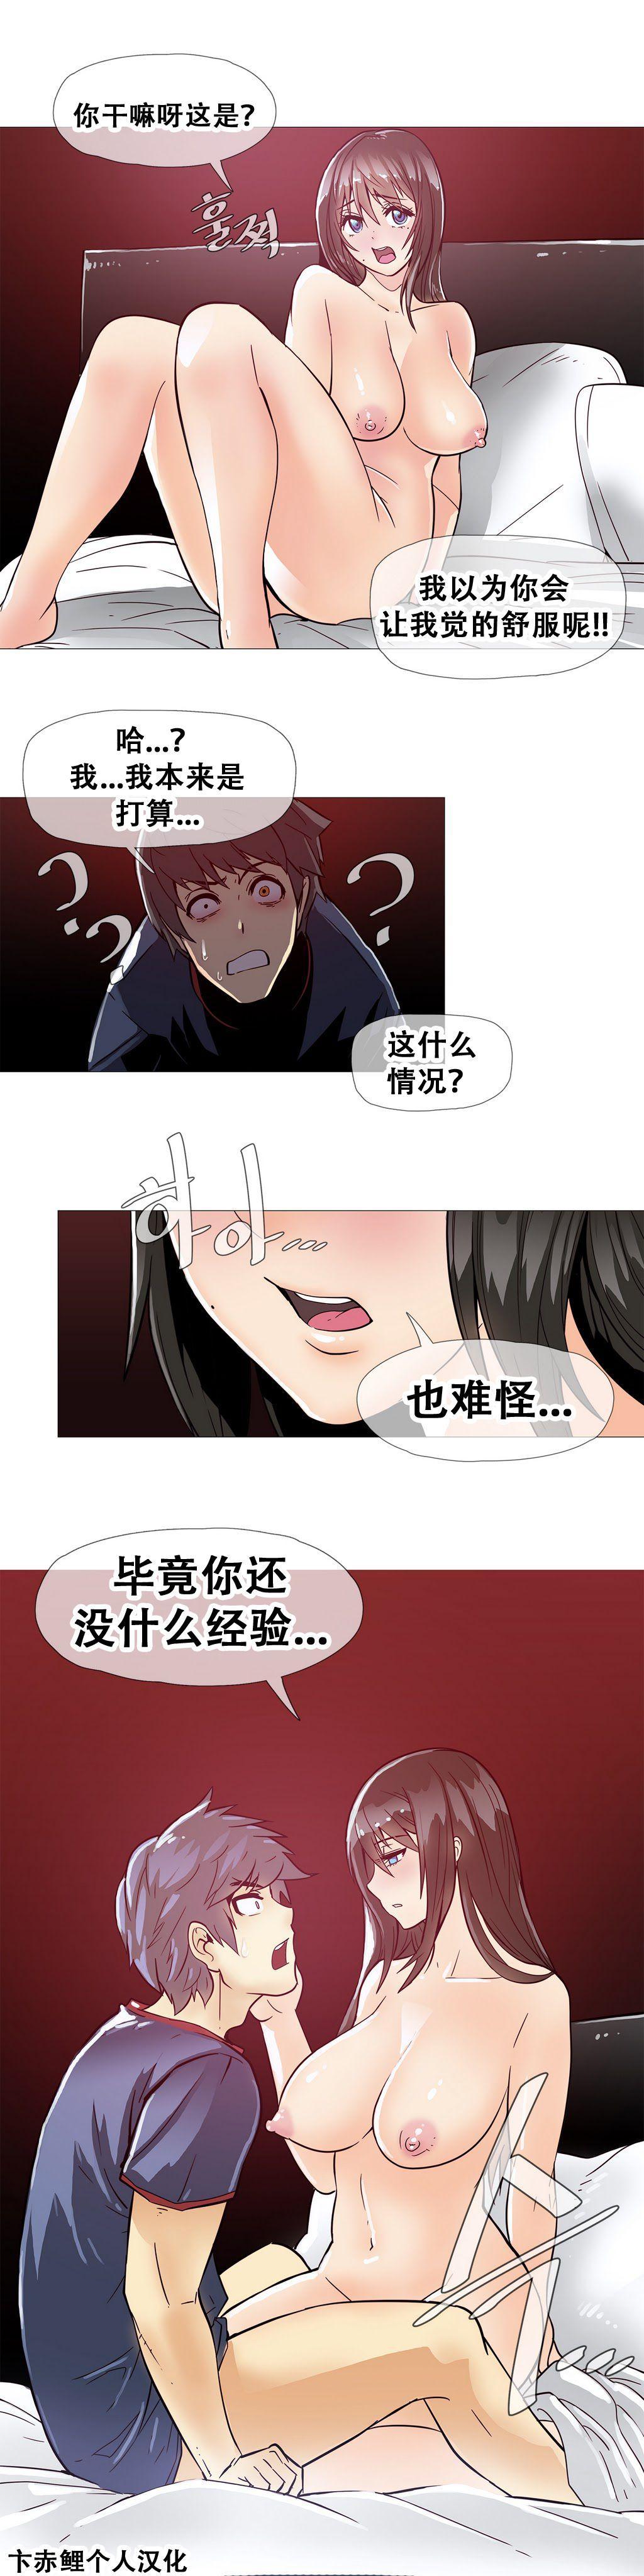 HouseHold Affairs 【卞赤鲤个人汉化】1~33话(持续更新中) 249